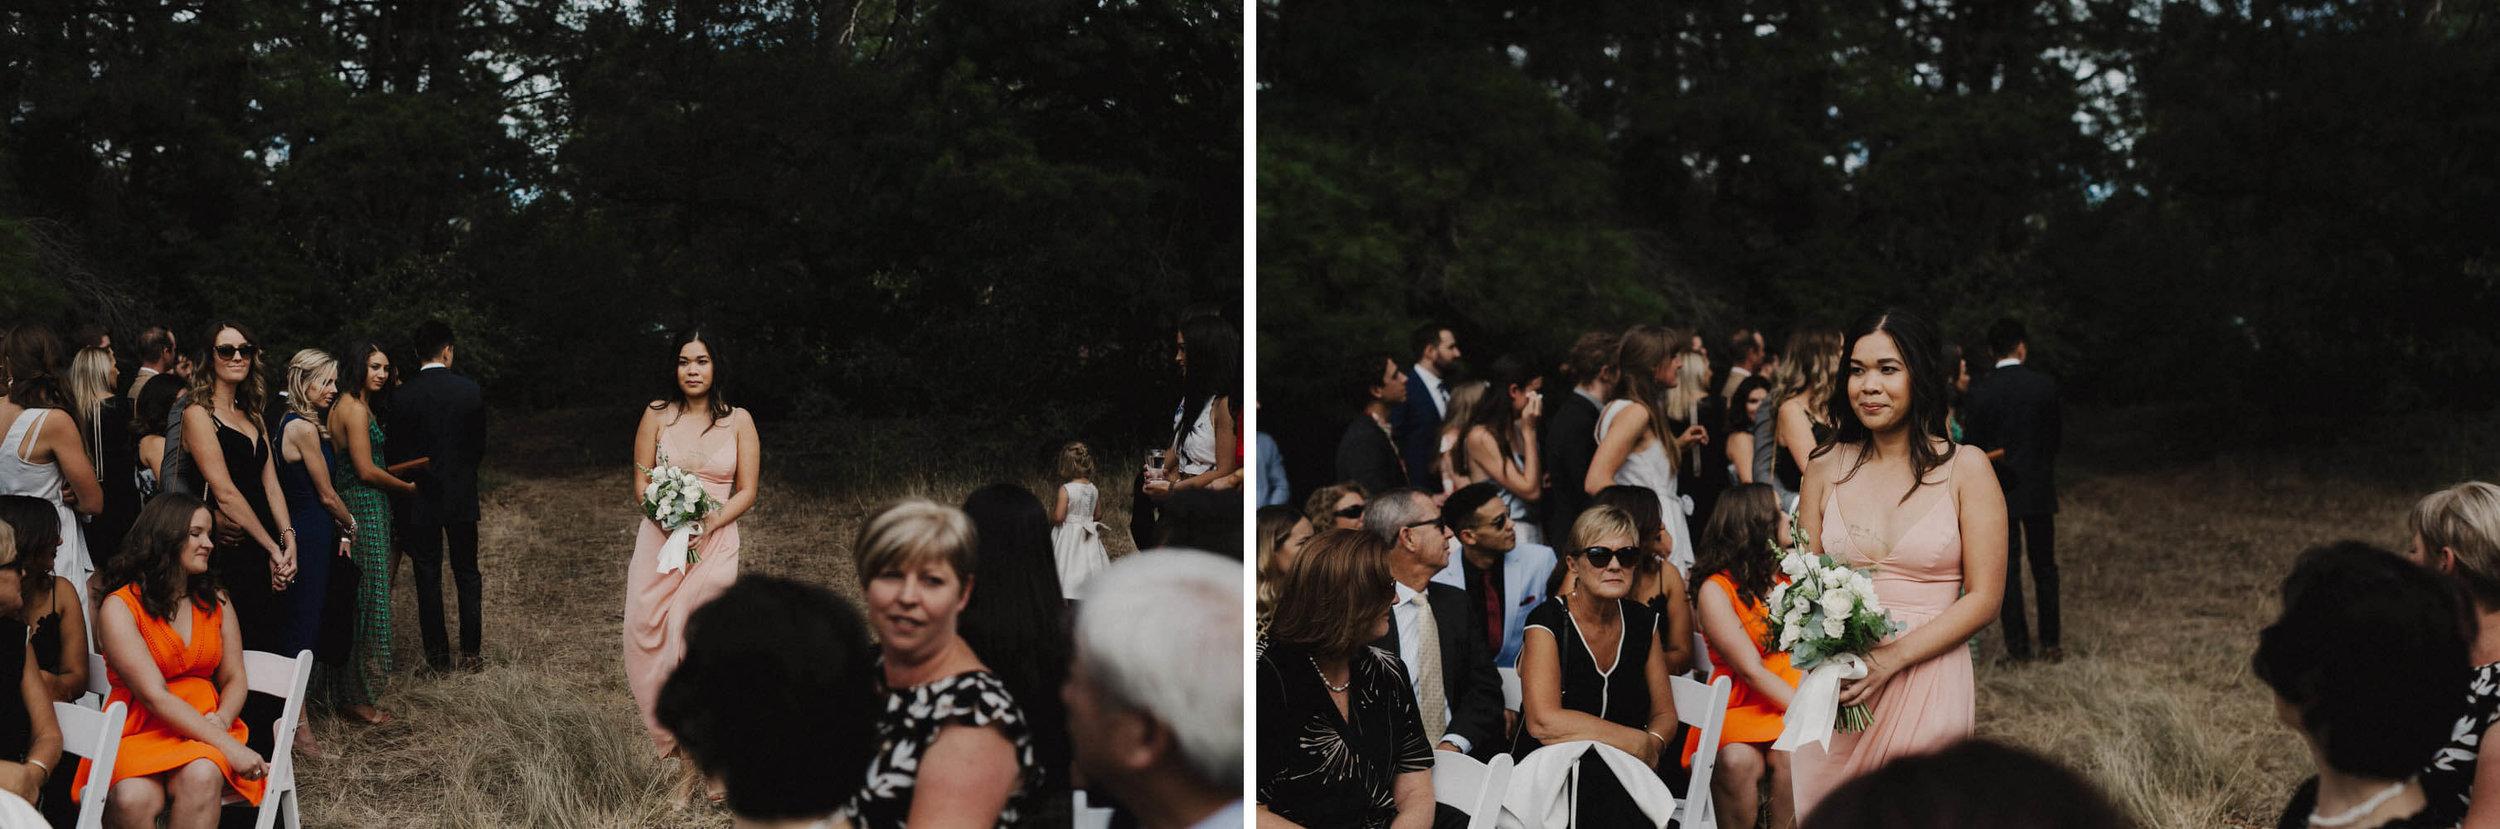 canberra-wedding-rose-gardens_136(7575)2.jpg